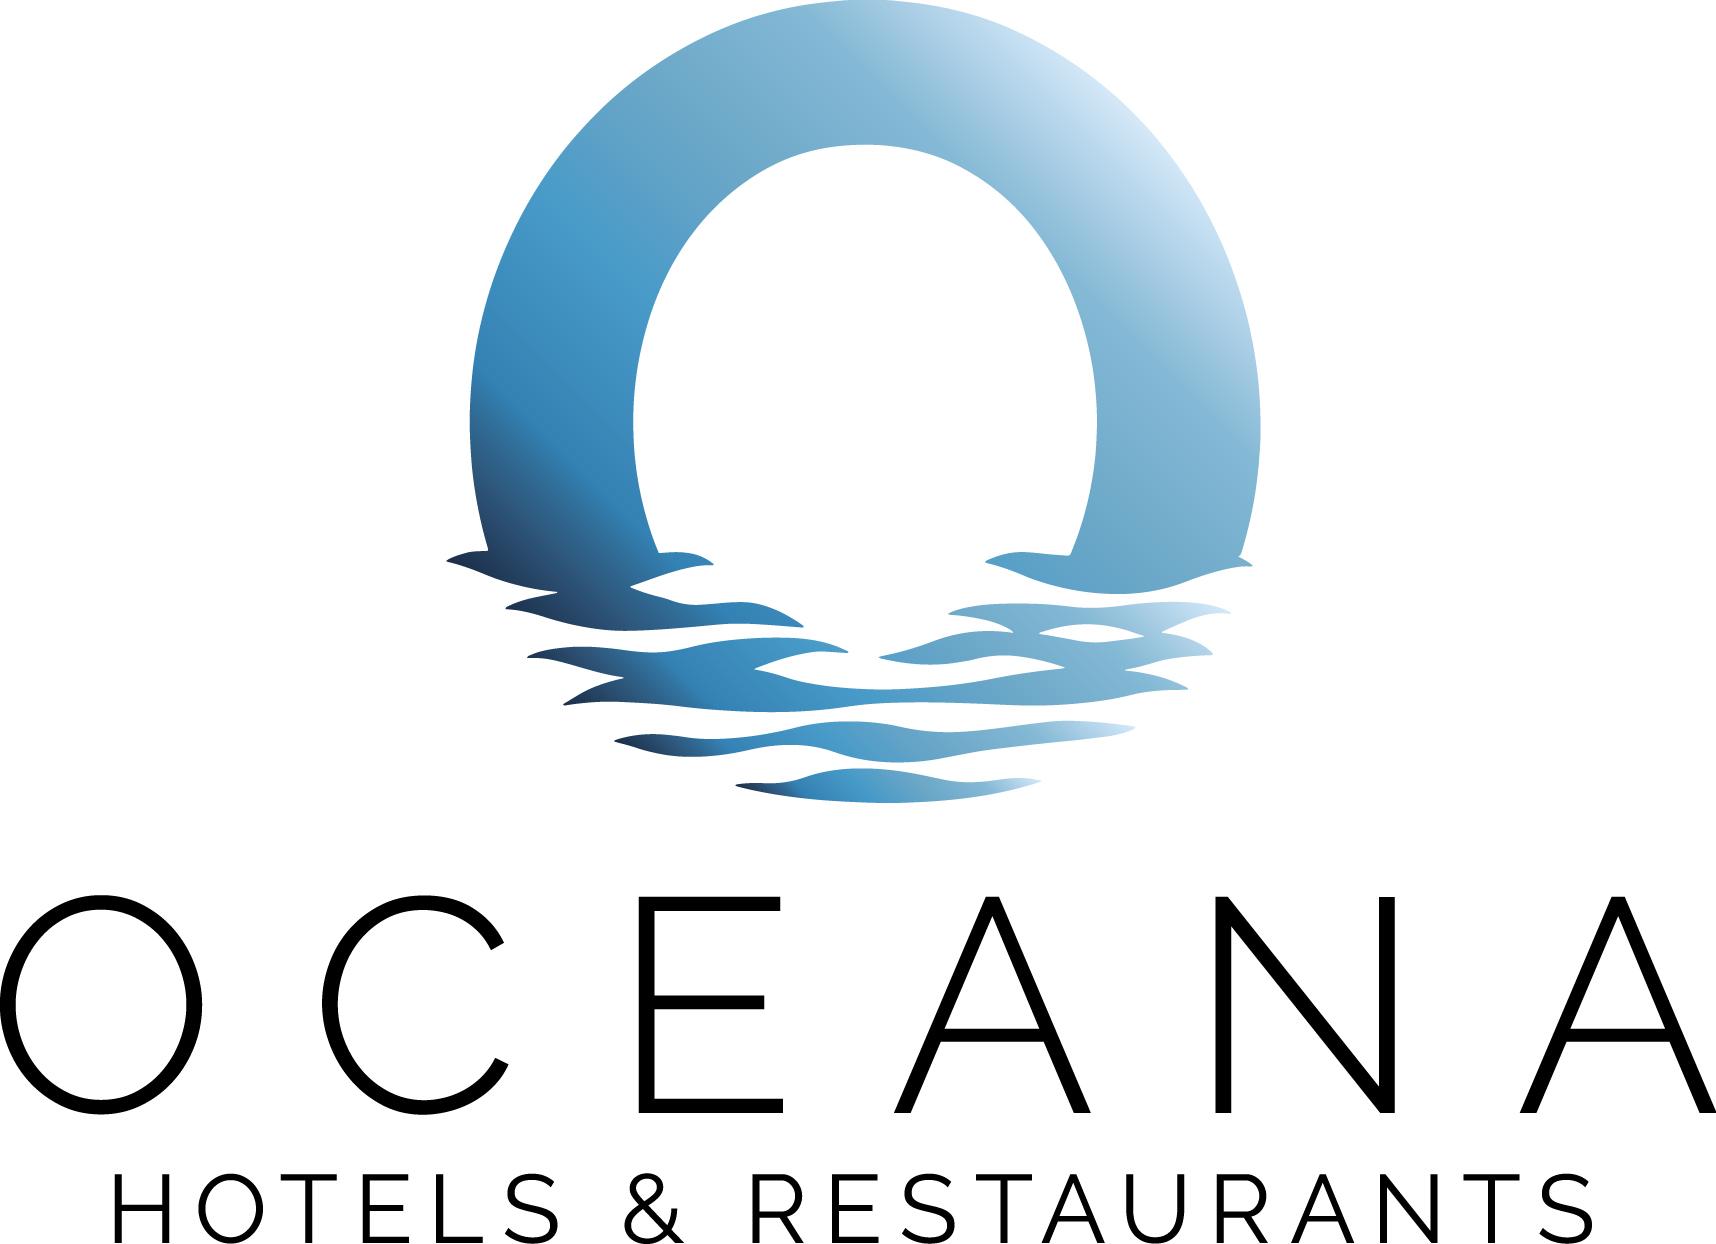 Oceana Hotels & Restaurants